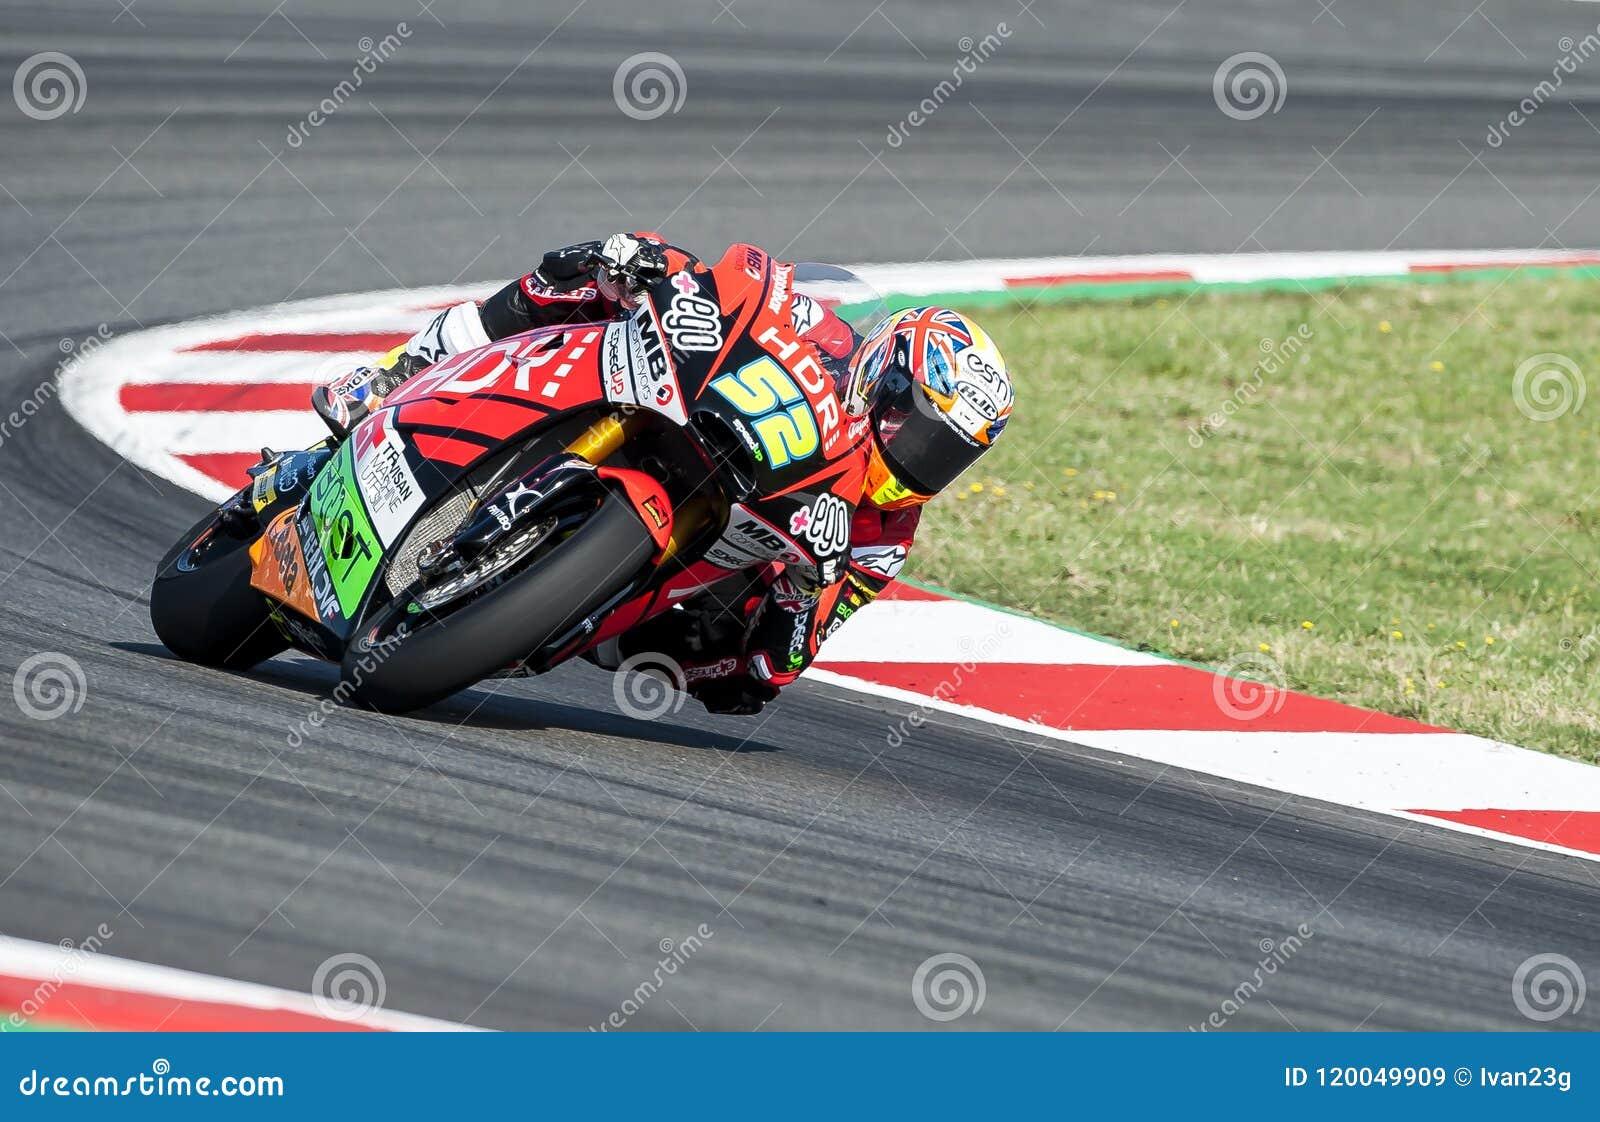 Gp Catalunya Motogp 2018 Editorial Stock Image Image Of Rider